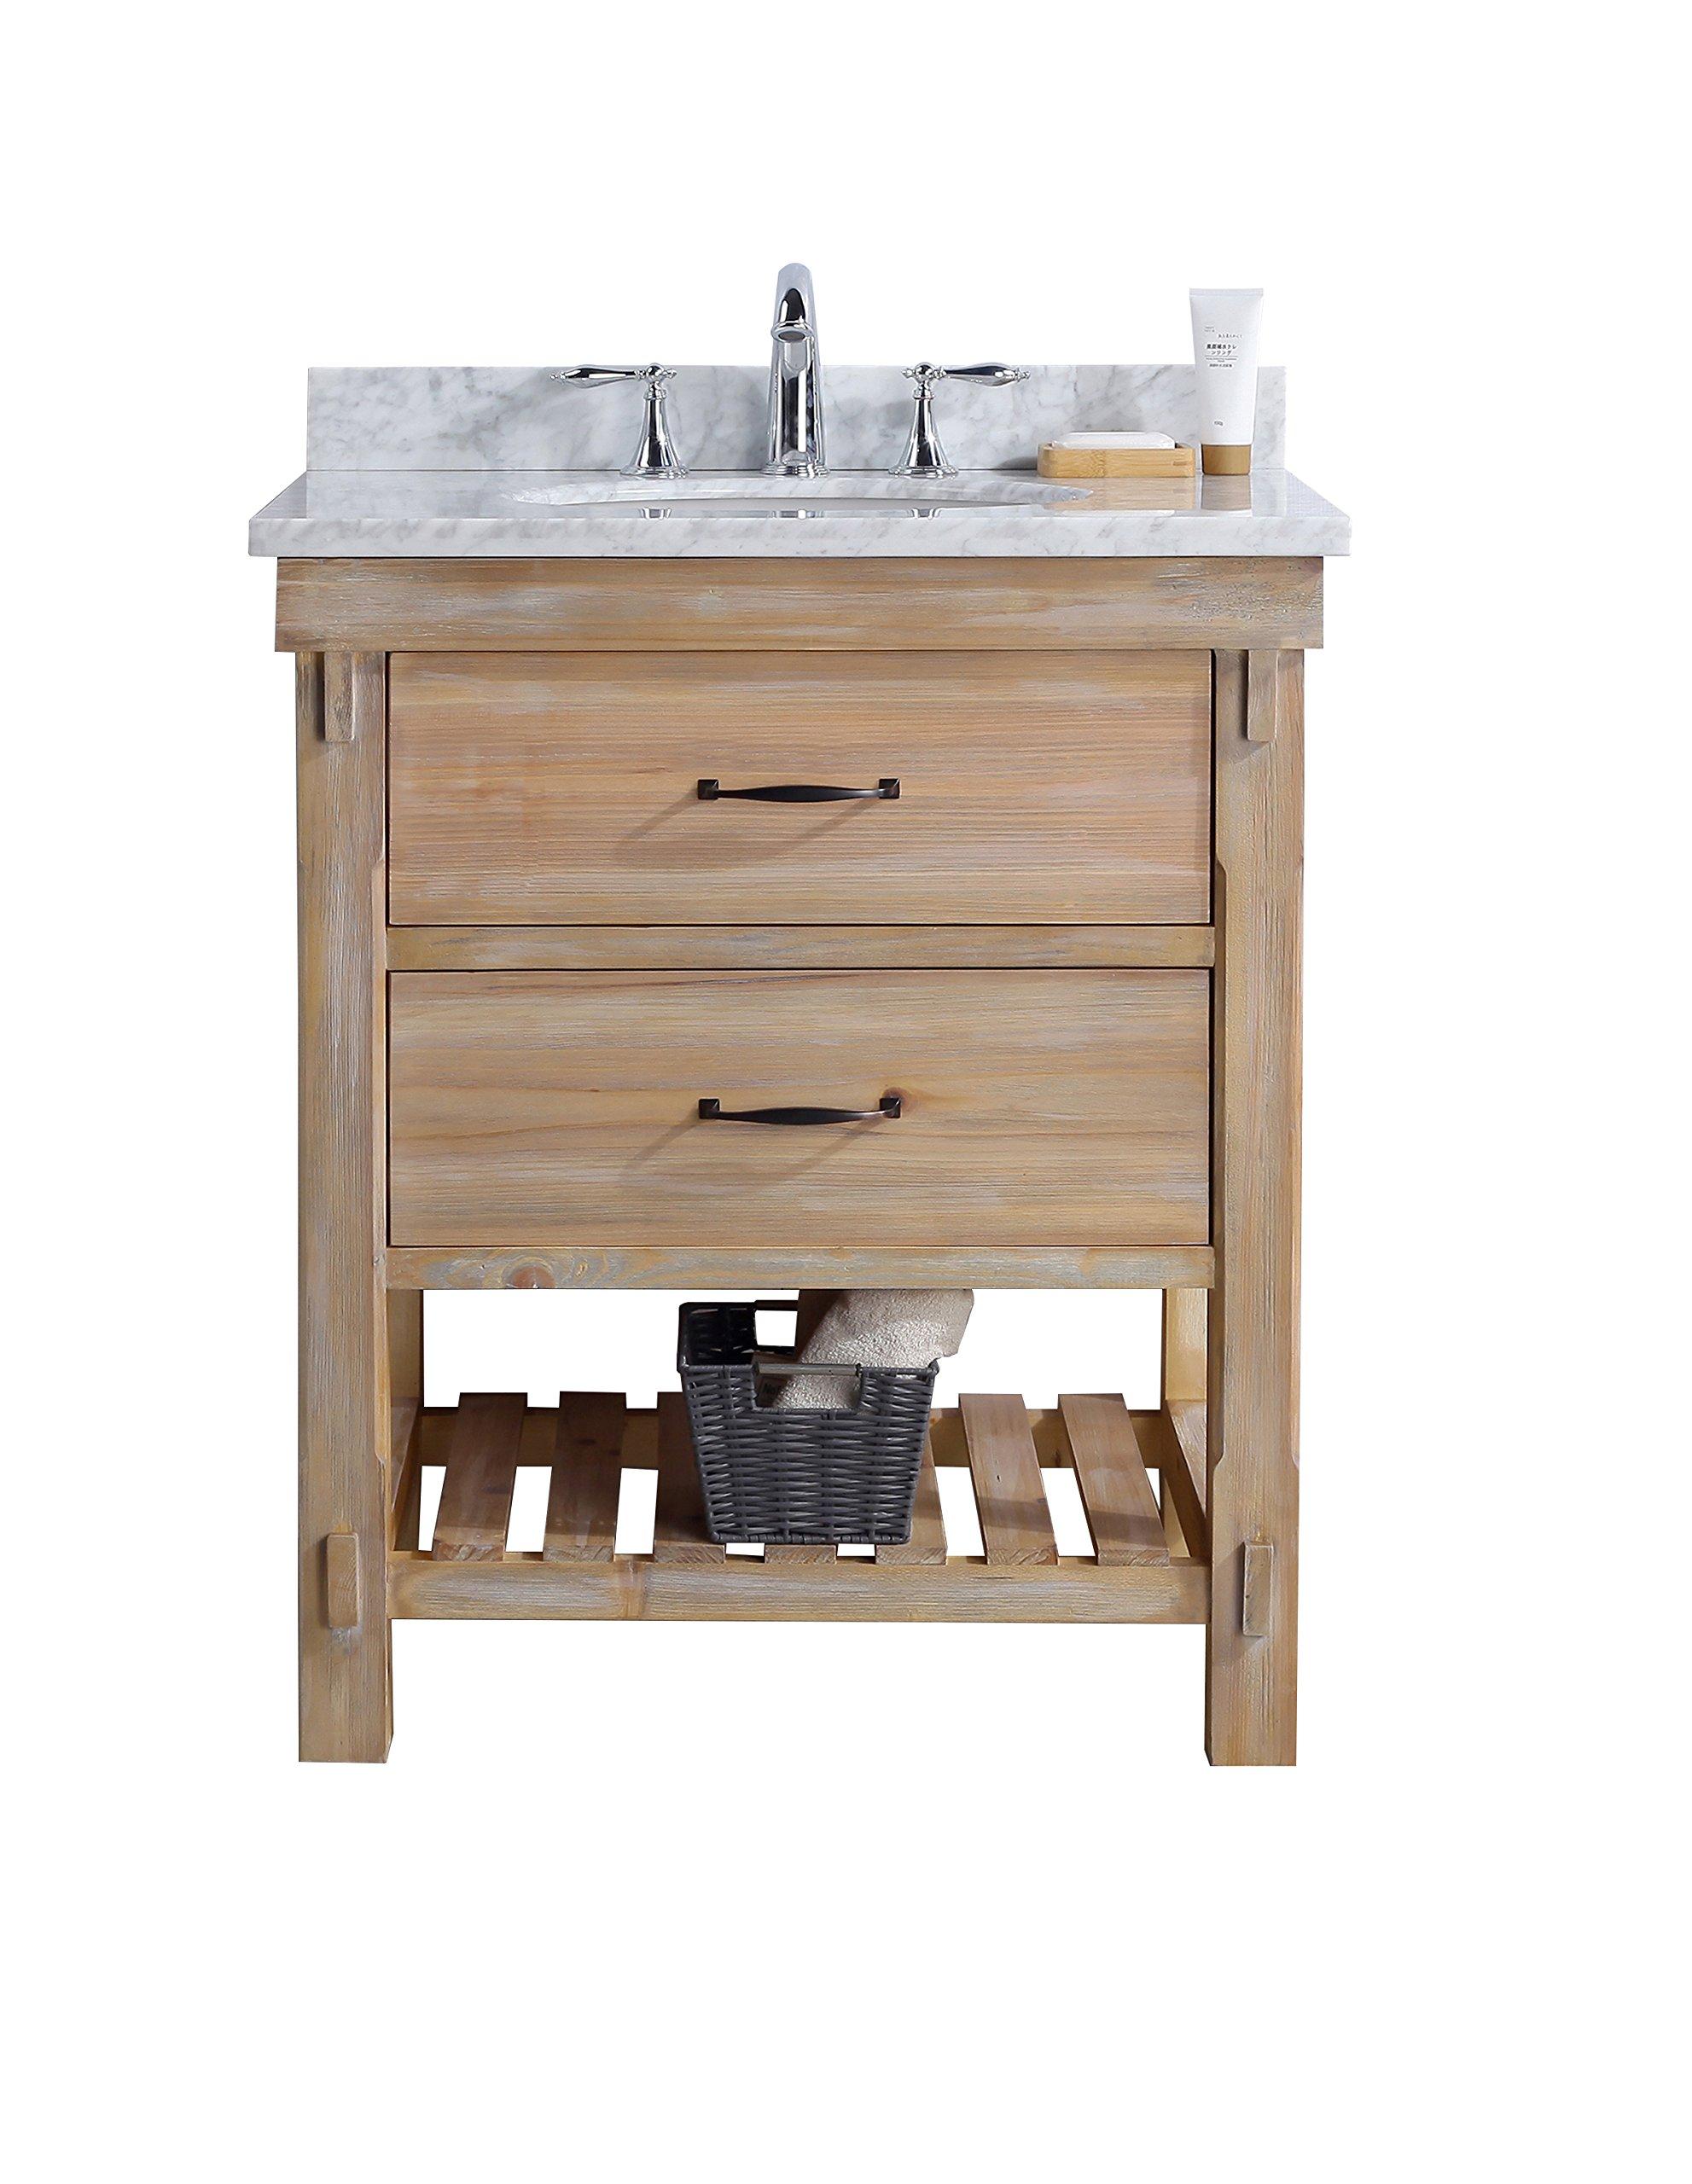 Bathroom Fixtures & Hardware -  -  - 81gI9zdZ7QL -